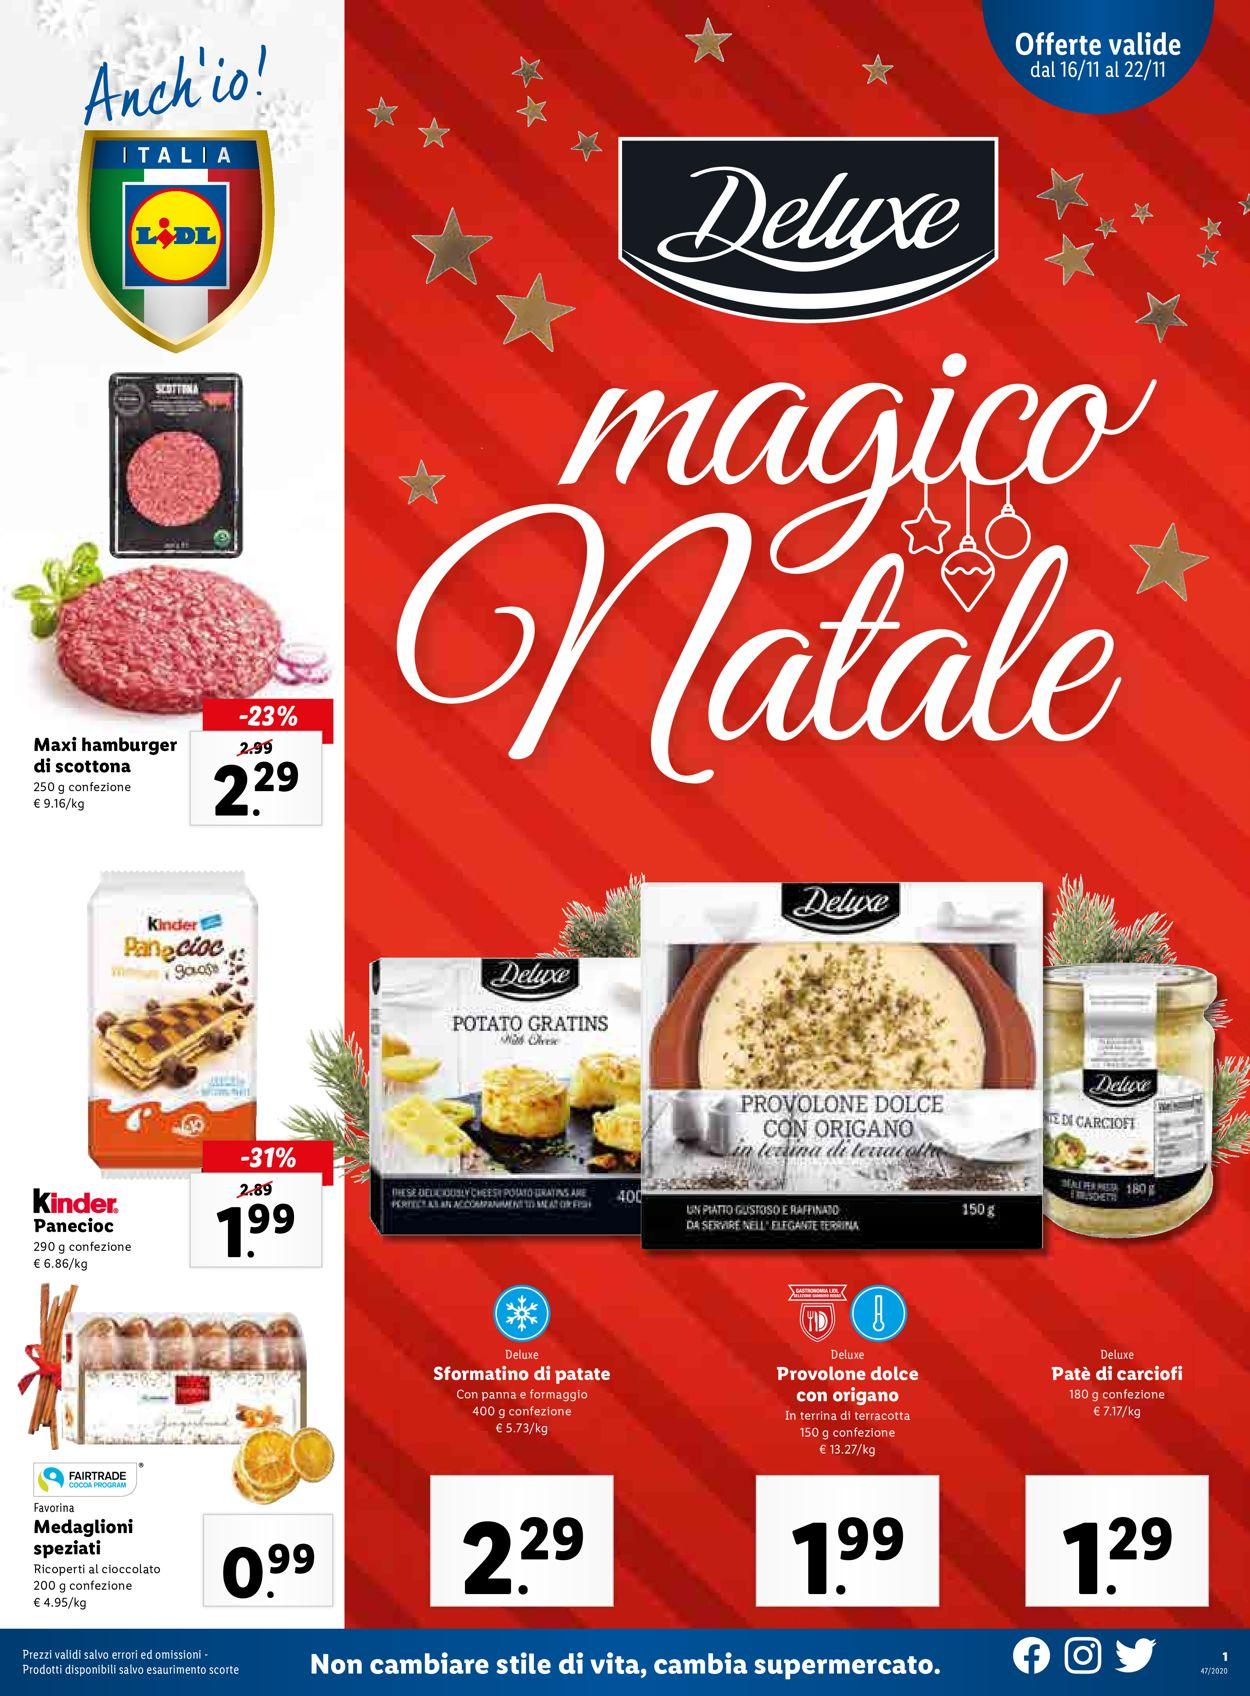 Volantino Lidl - Natale 2020 - Offerte 16/11-22/11/2020